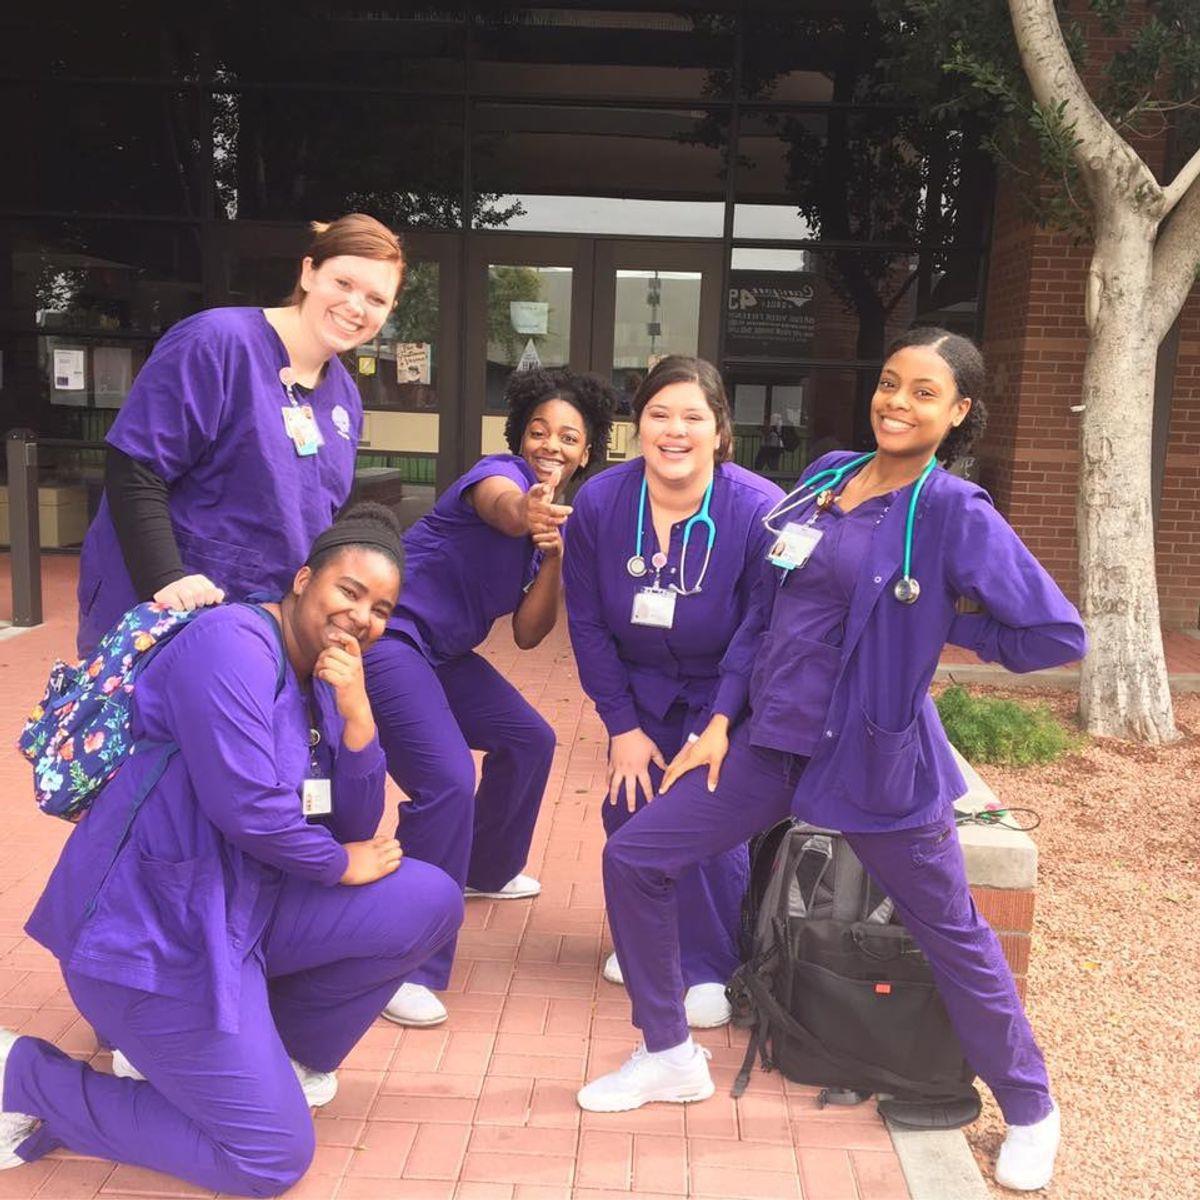 10 Reasons Why Nurses Make The Best Friends